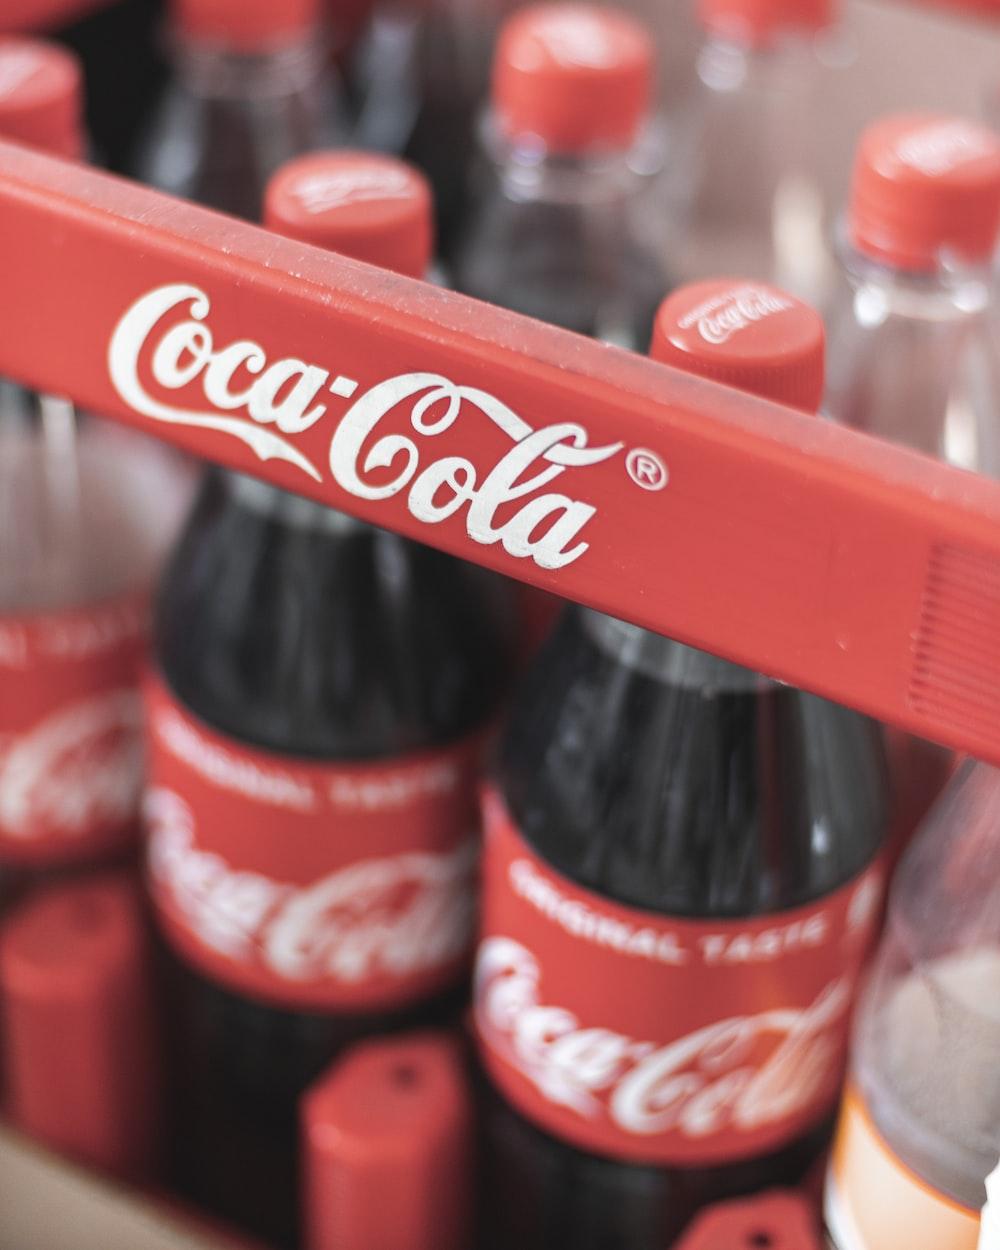 coca cola plastic bottle on red plastic crate